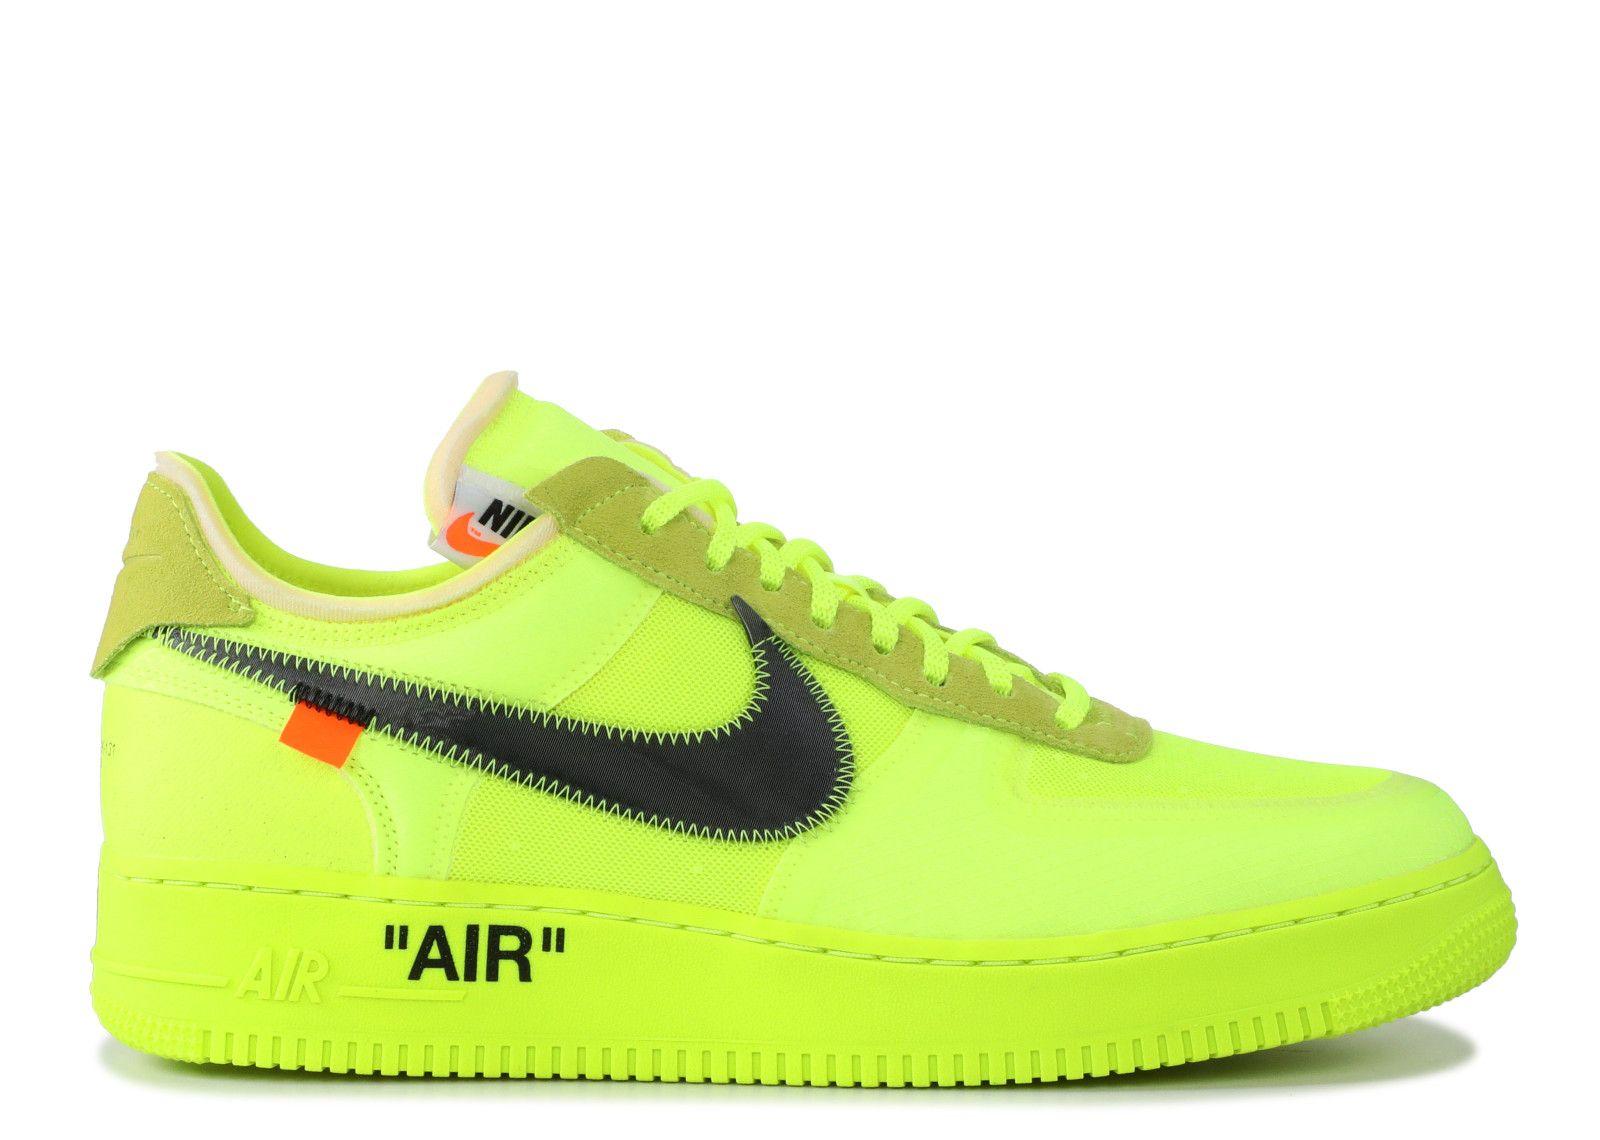 Pin by social media on Sneakers in 2020 Nike air monarch